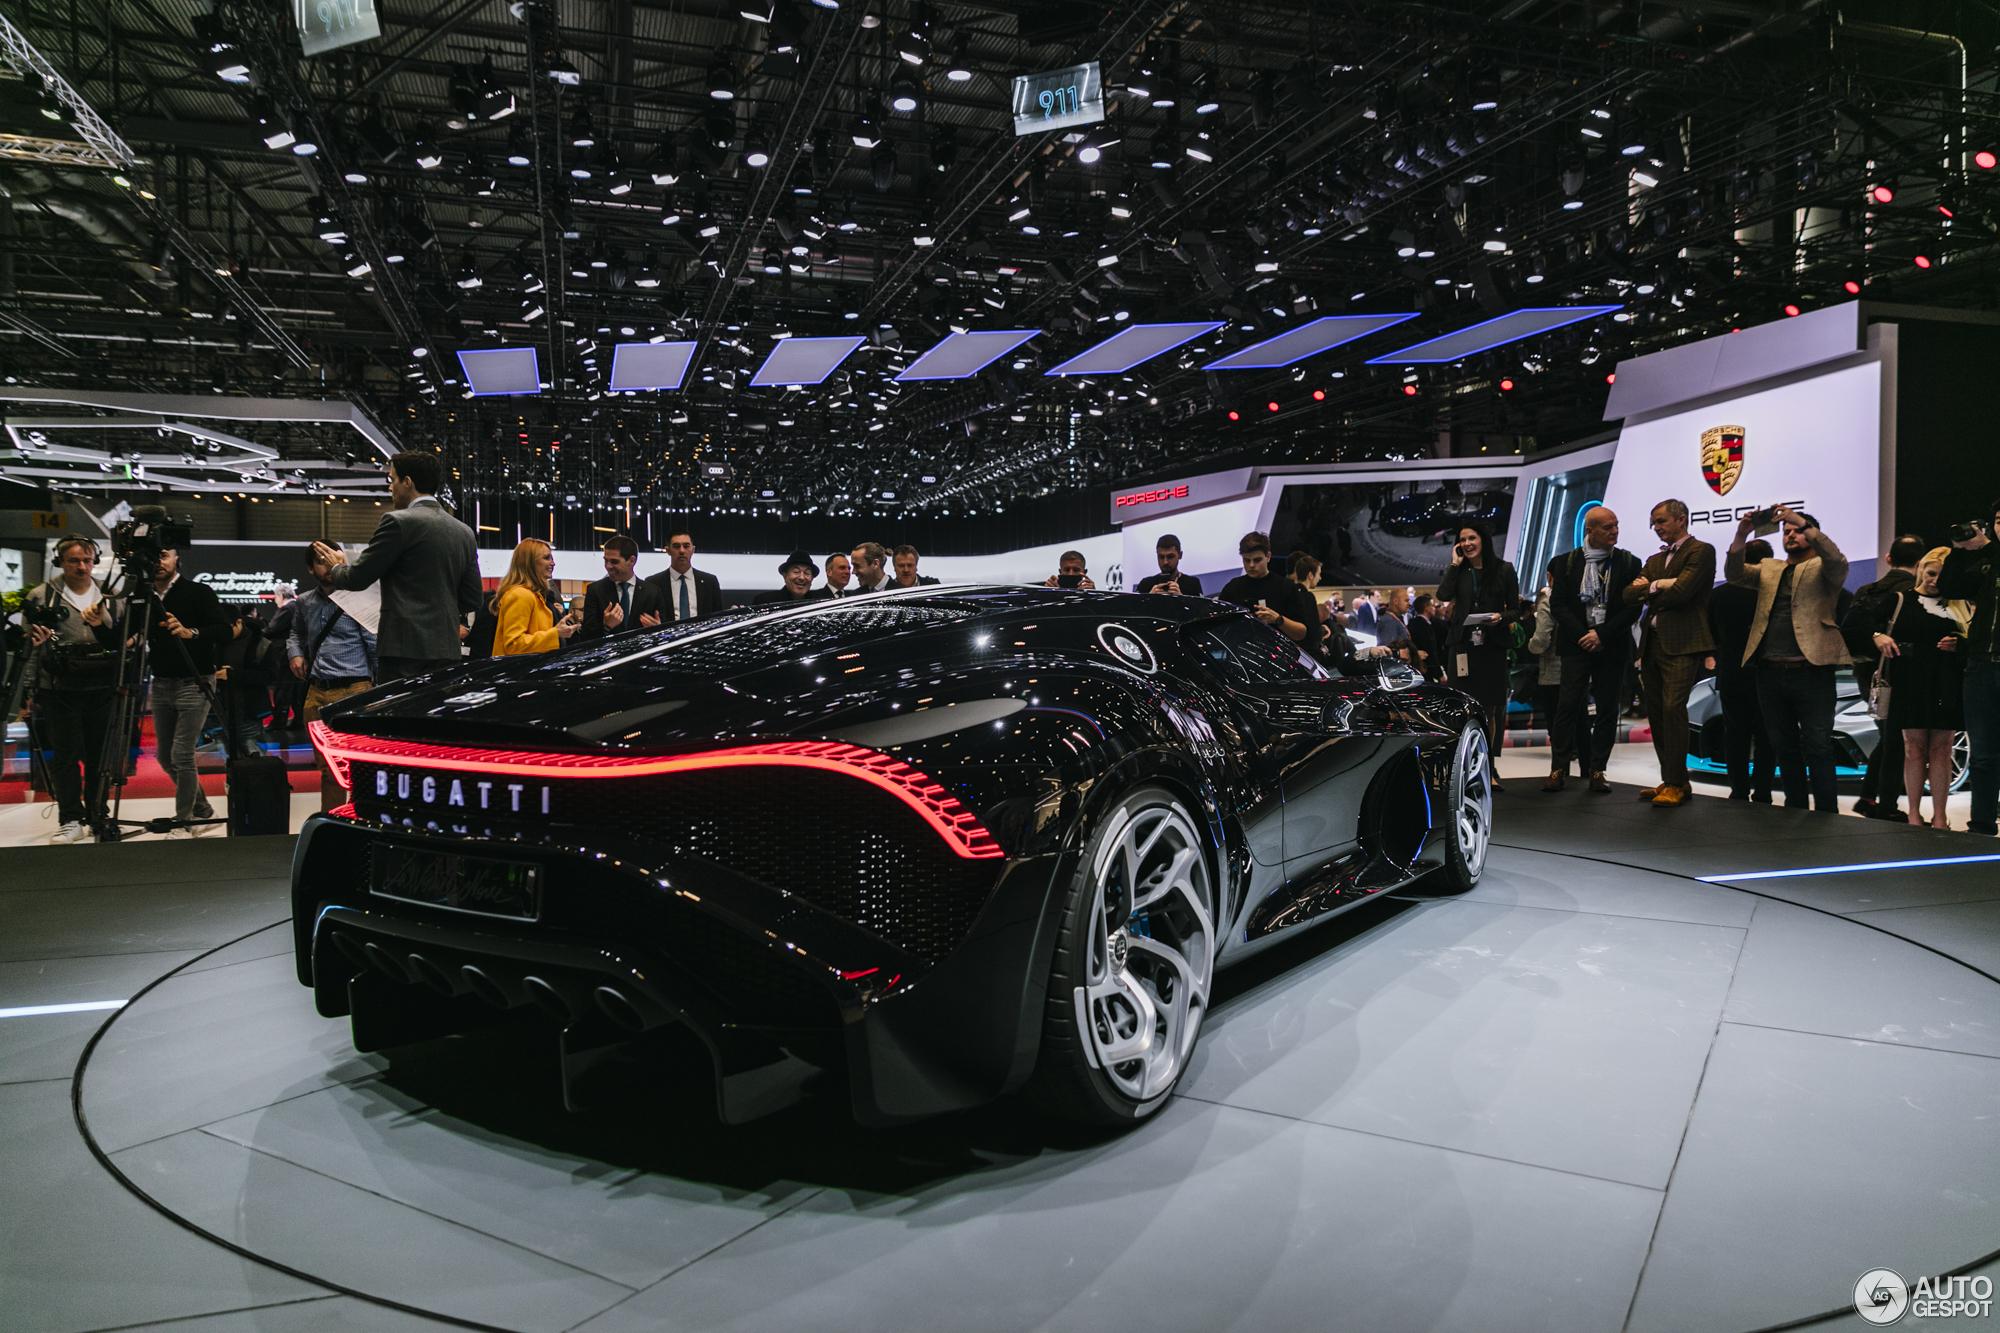 Download 2019 Bugatti La Voiture Noire Luxury Car: Geneva 2019: Bugatti La Voiture Noire